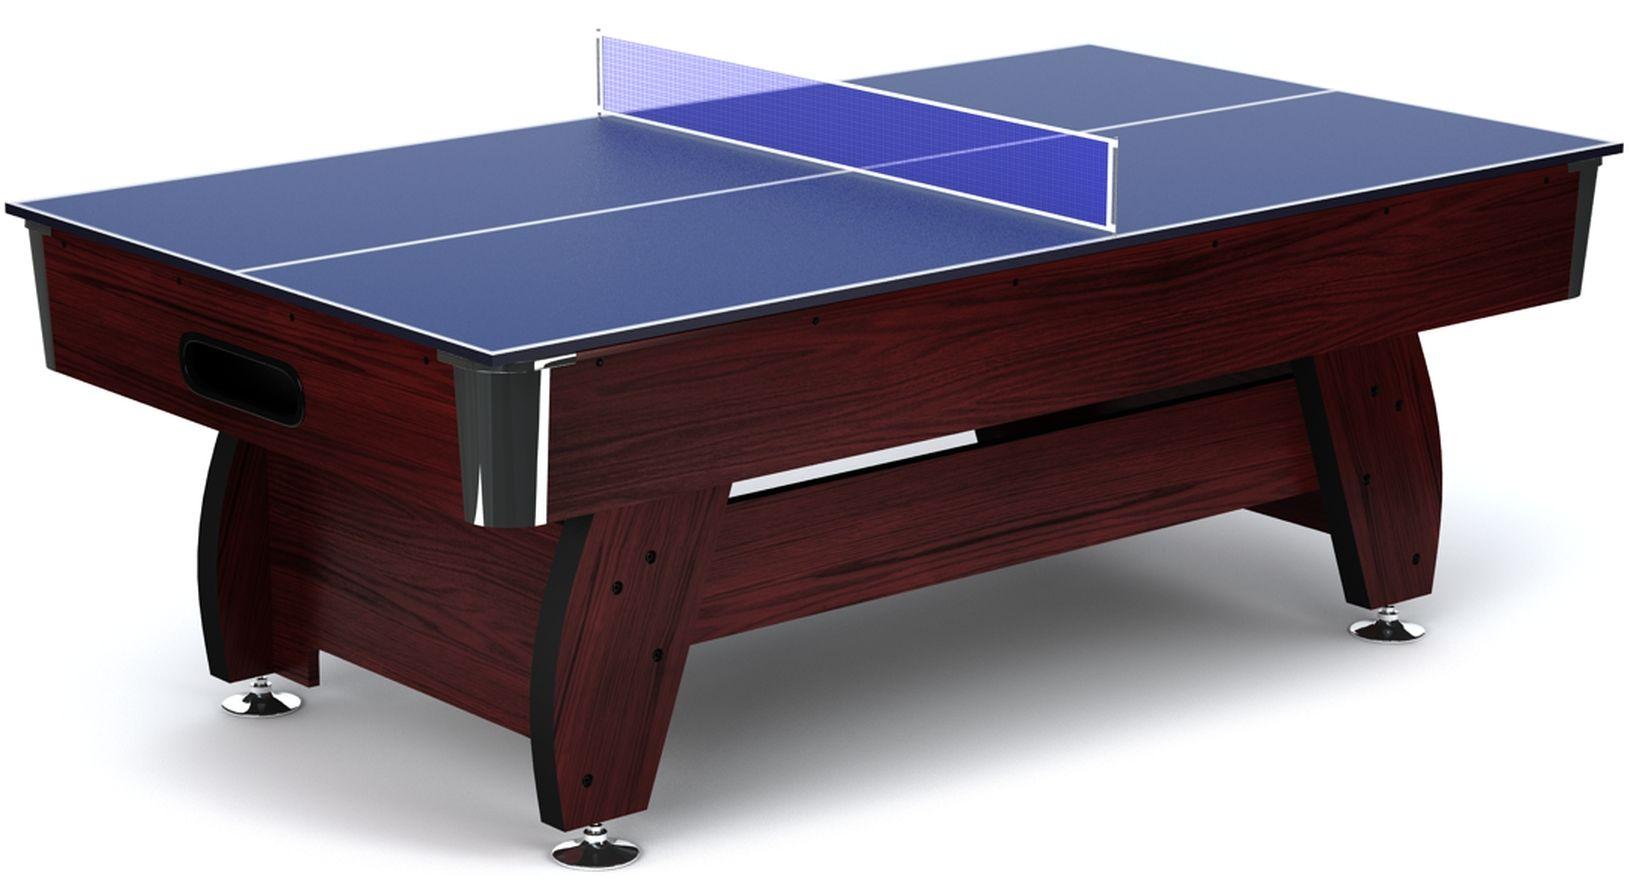 Nakładka Ping-Pong Blat na stół bilardowy 8ft Wiśnia